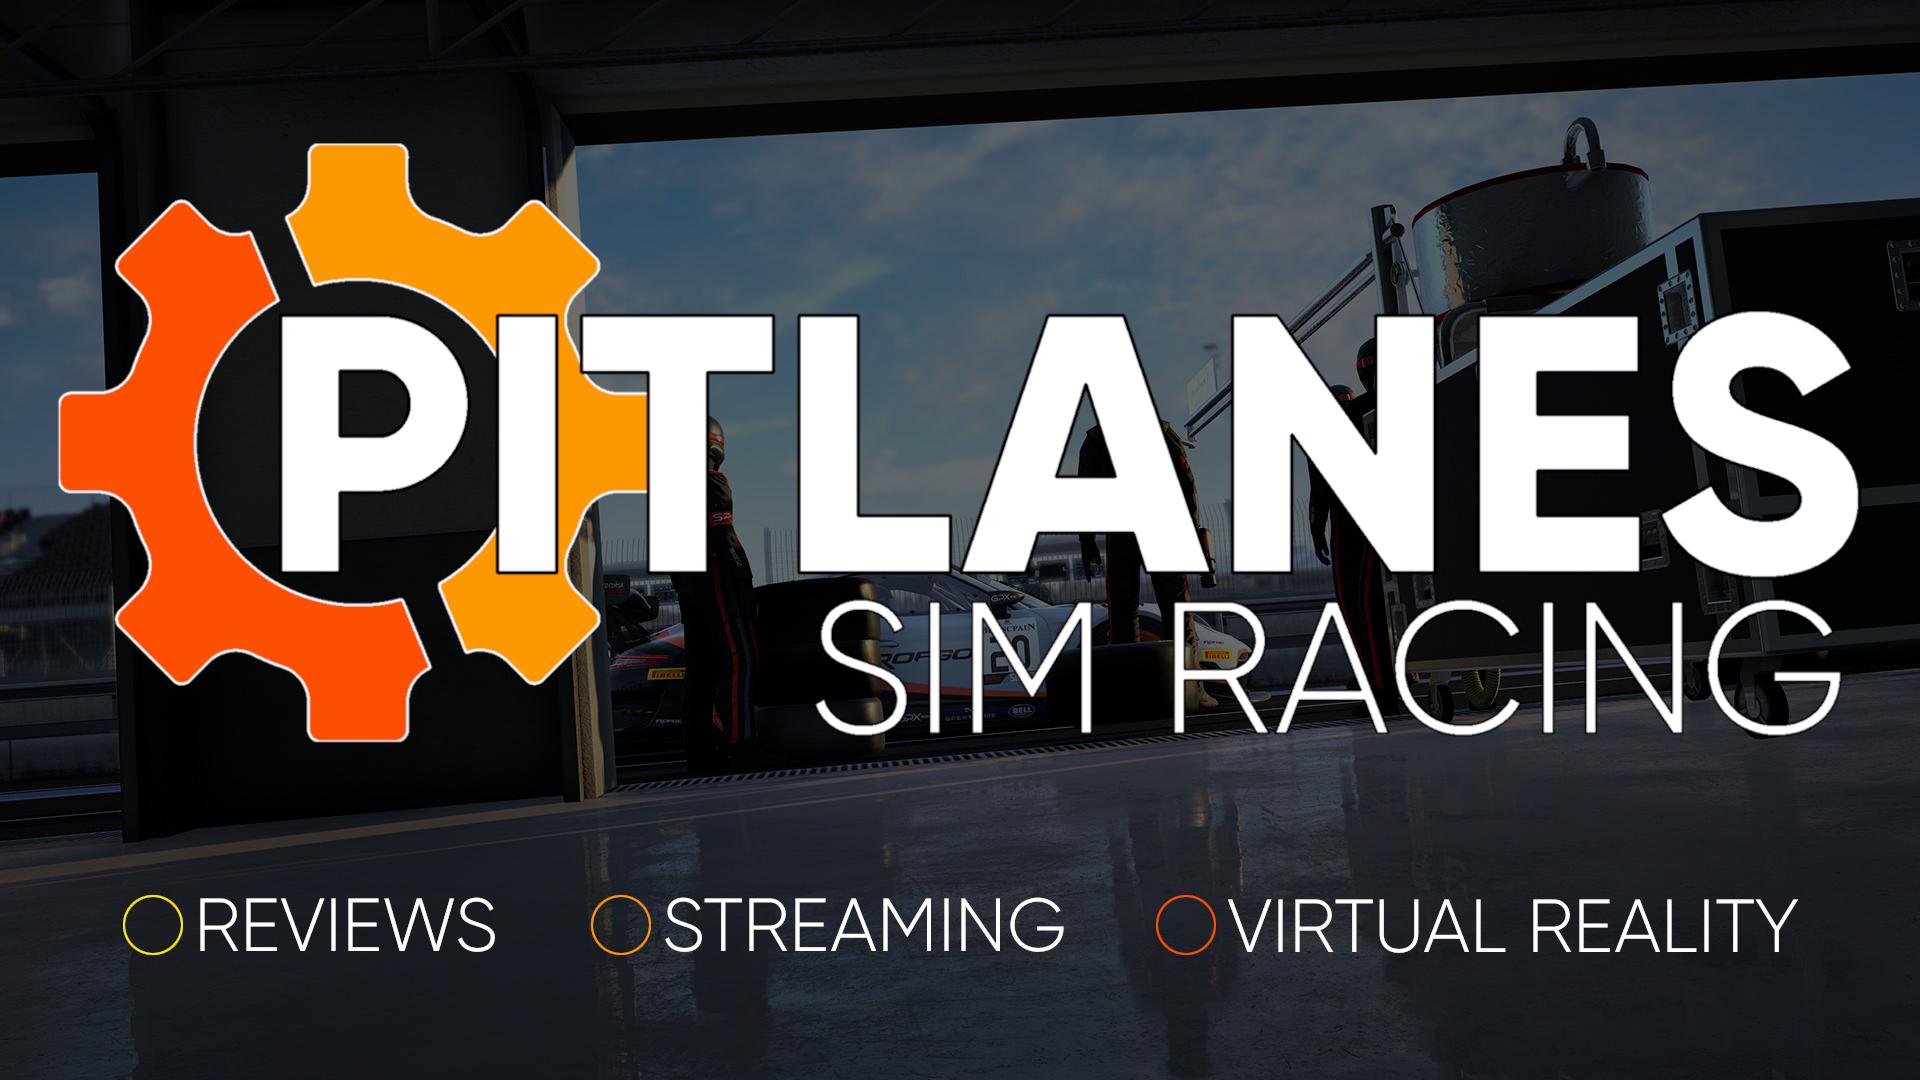 Pitlanes Sim Racing